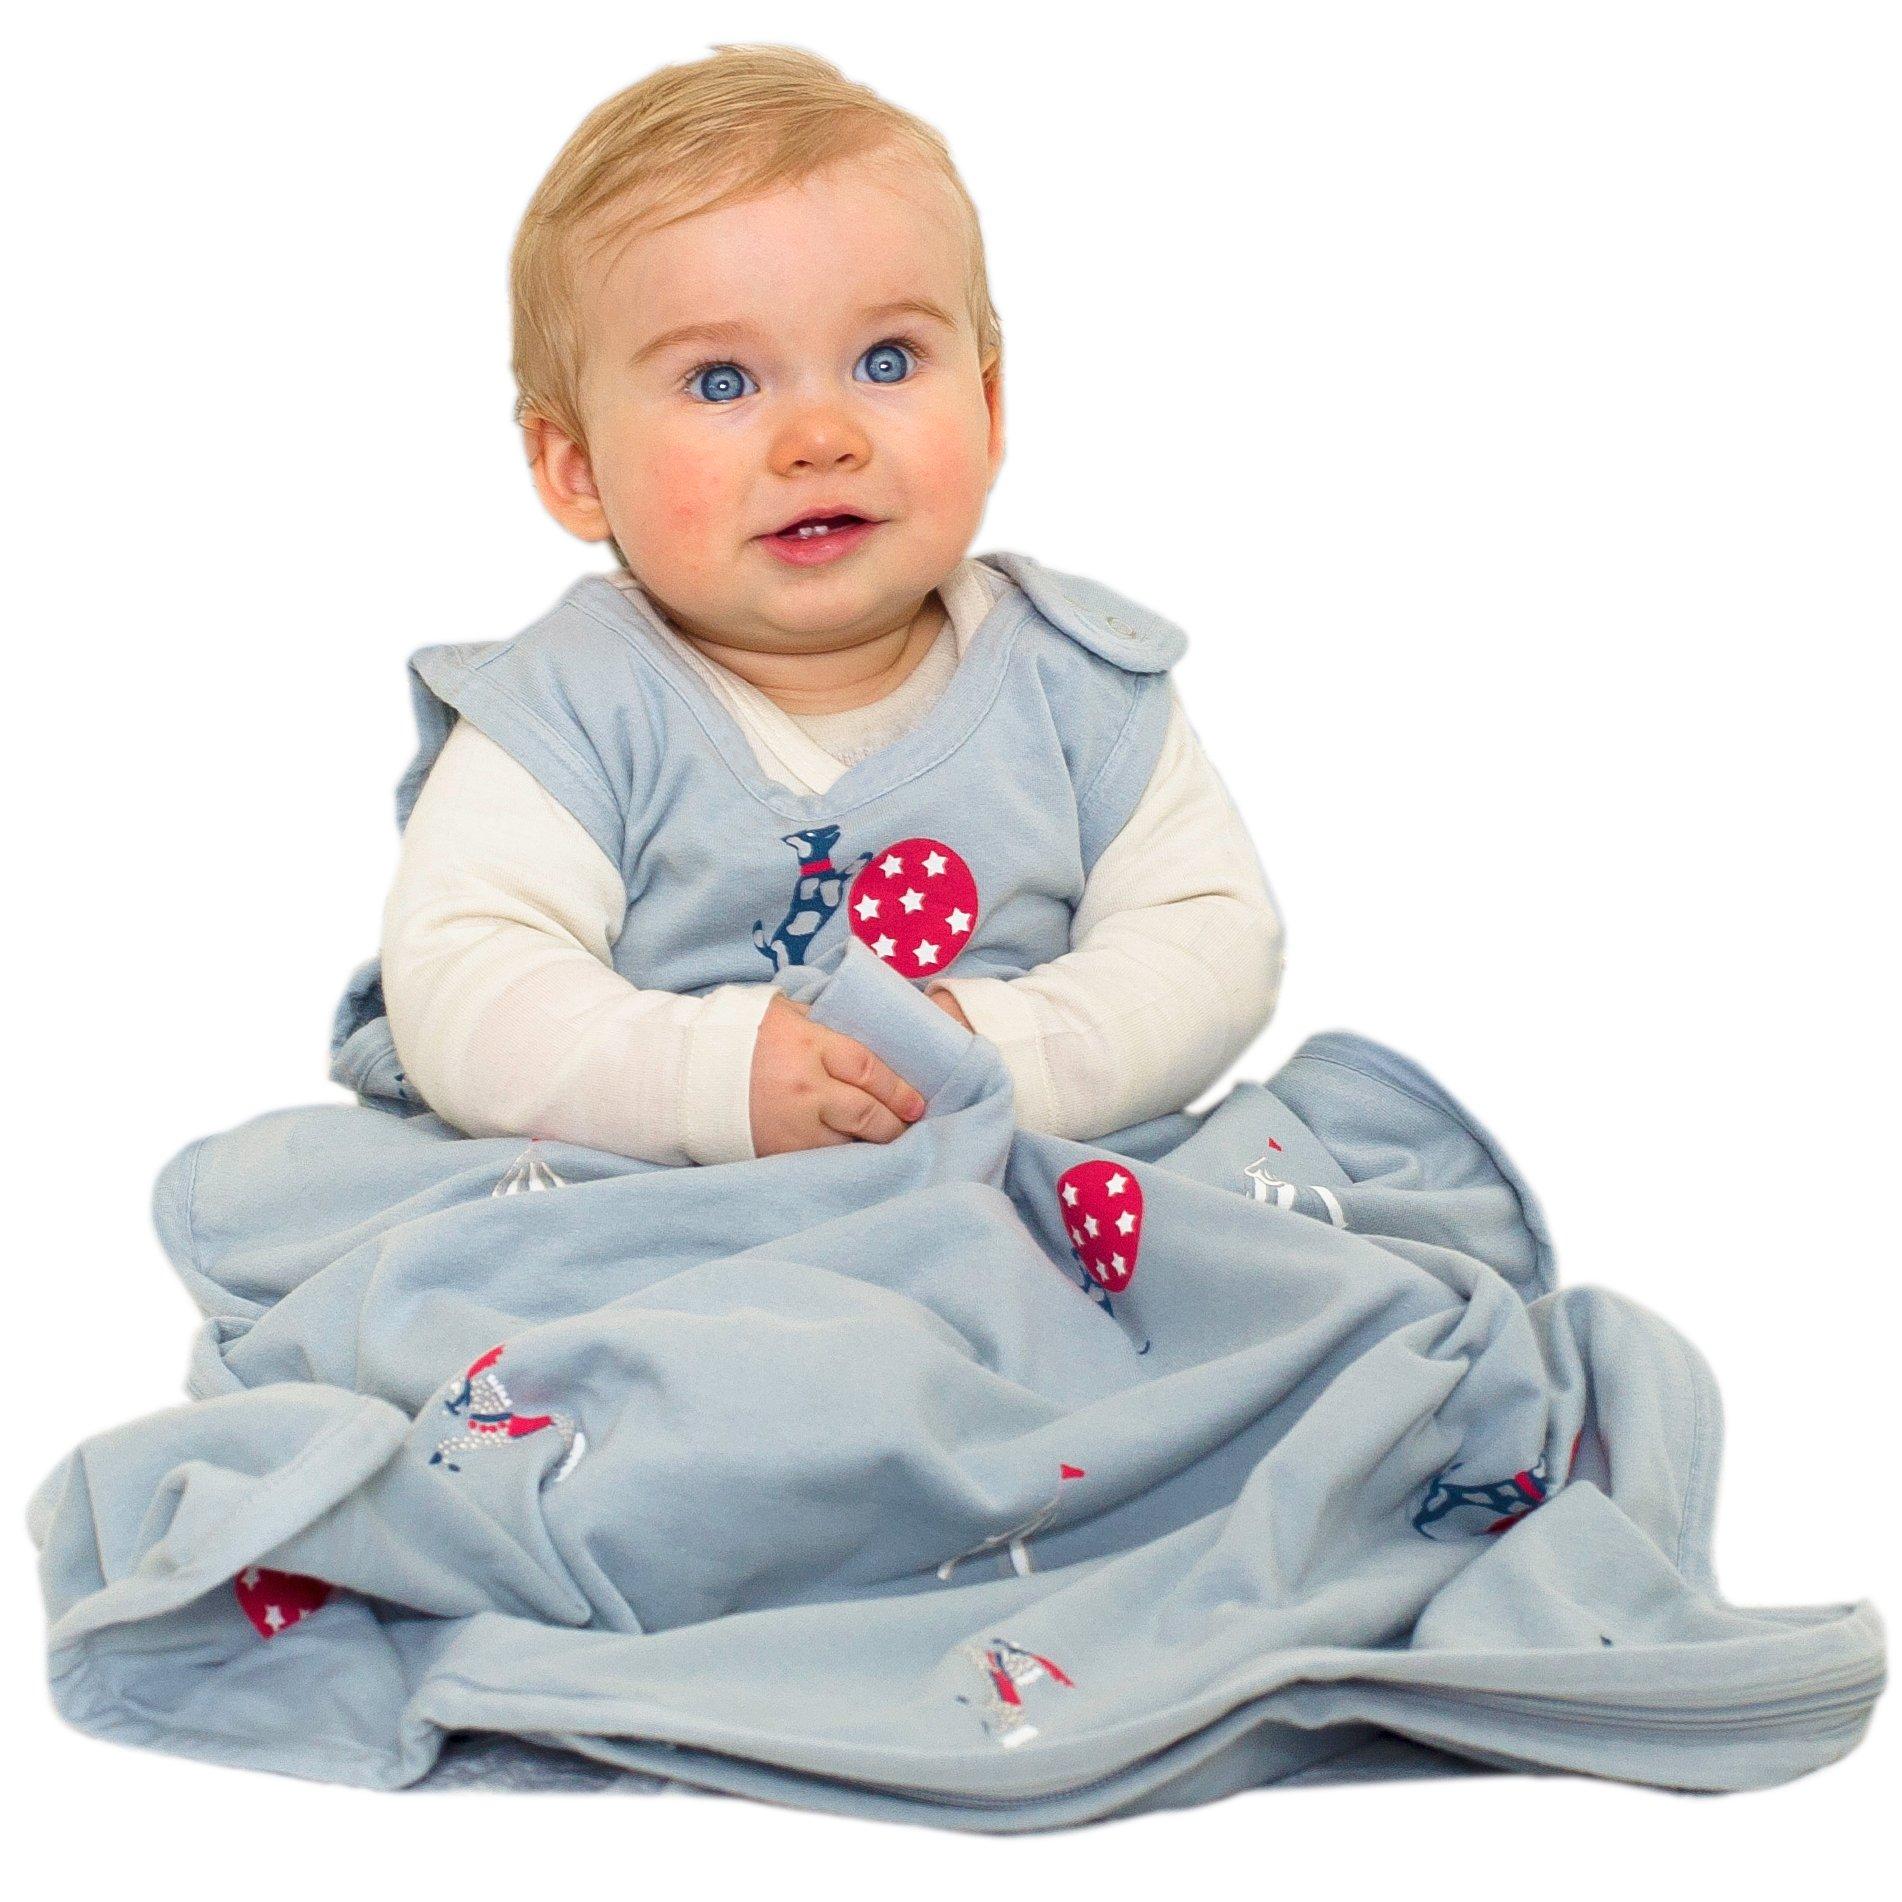 Merino Kids Organic Cotton, Circus Print, Baby Sleep Bag, for Toddlers 2-4 Years, Sky